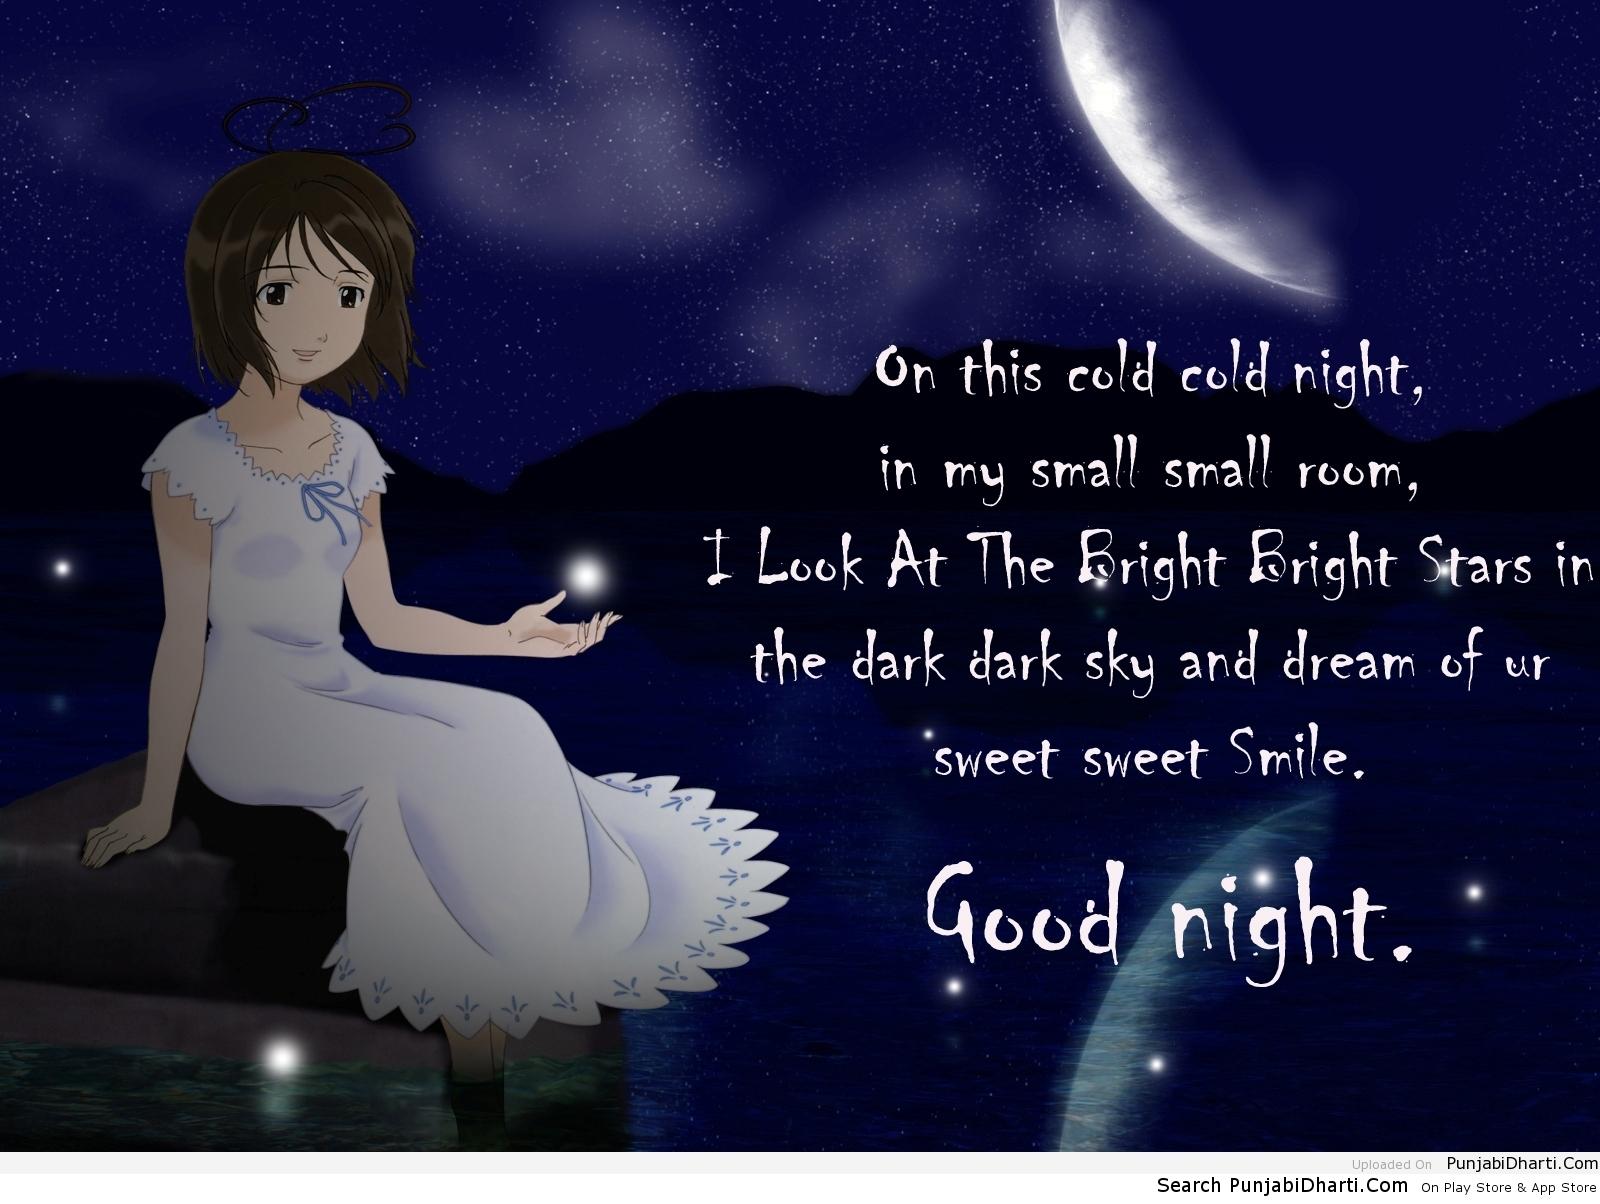 good night | punjabidharti